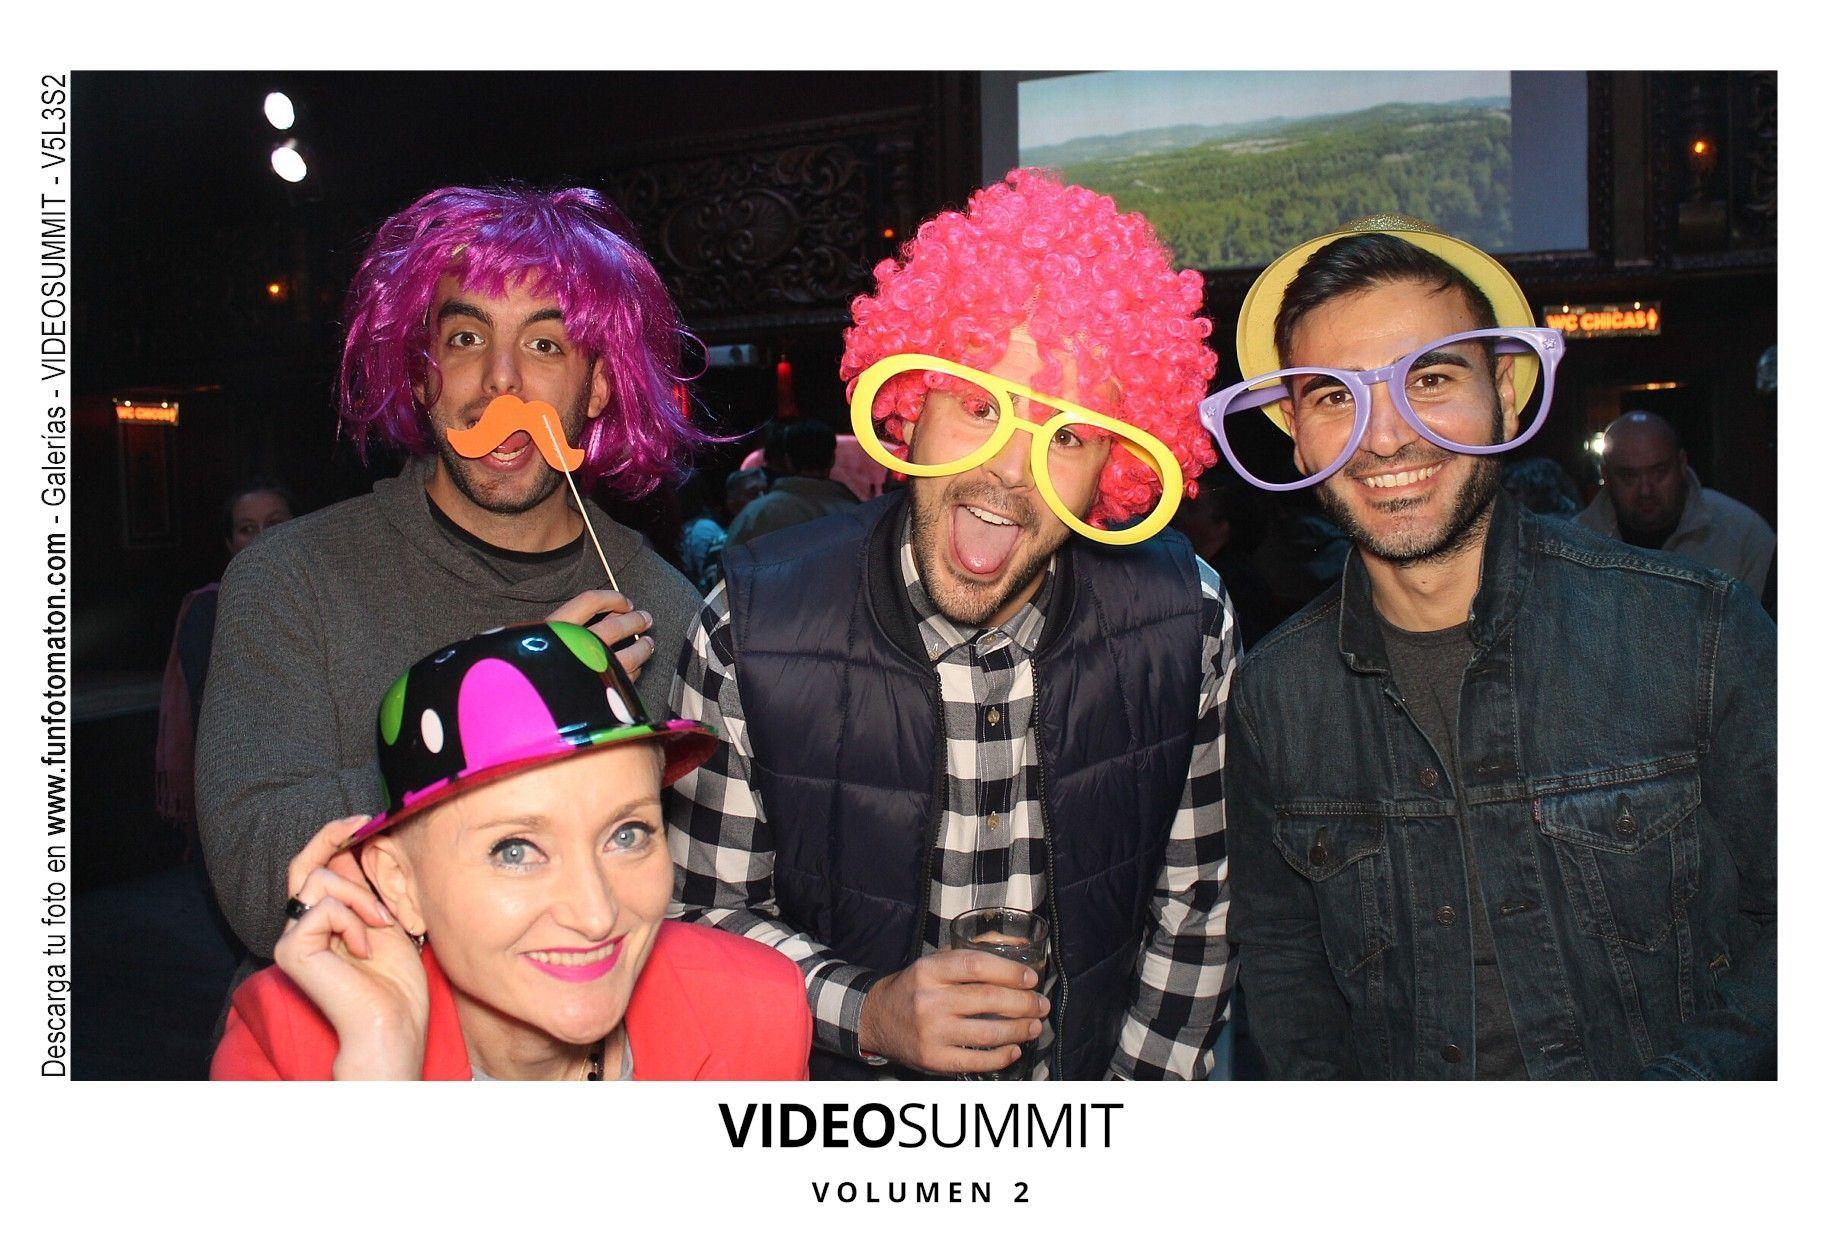 videosummit-vol2-club-party-059